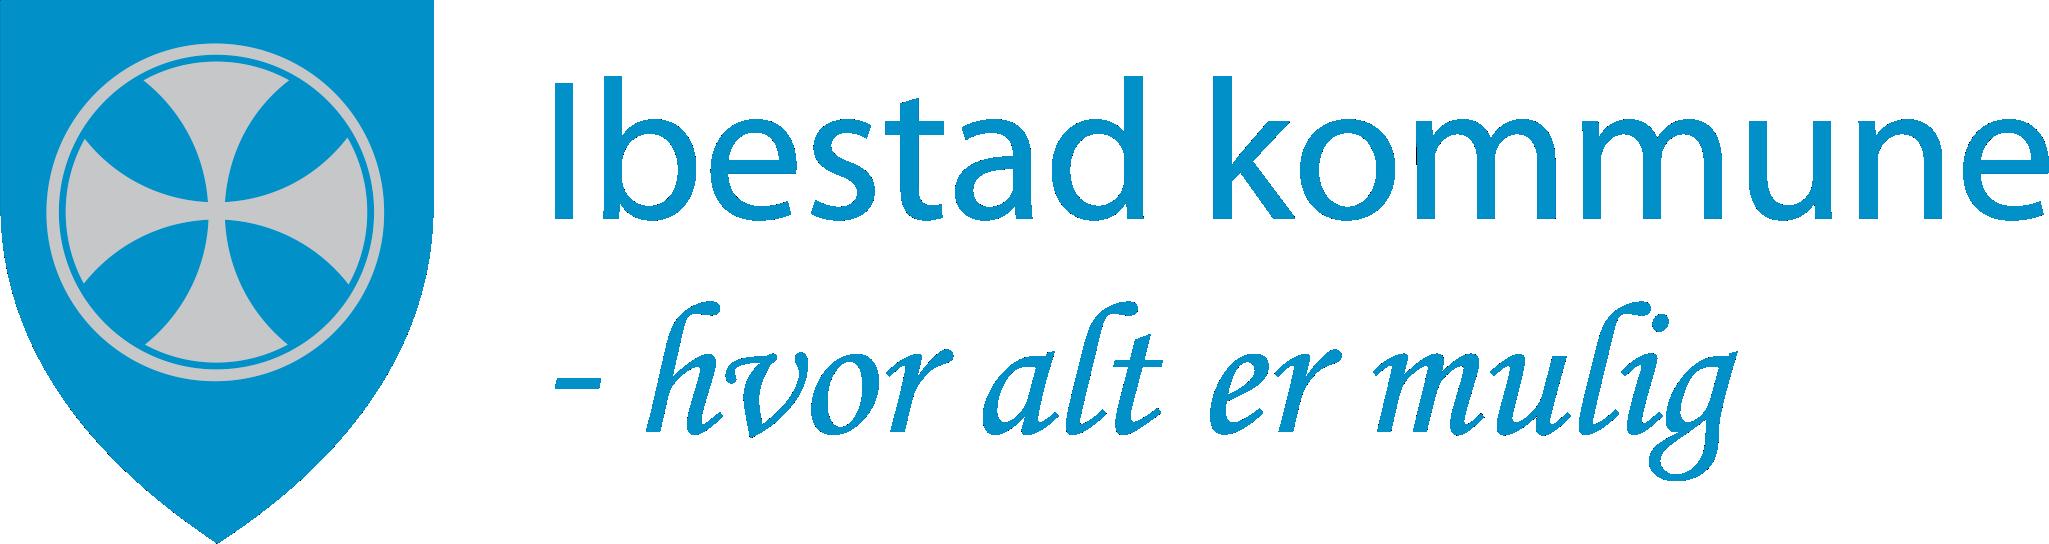 Ibestad Kommune sitt kommunevåpen